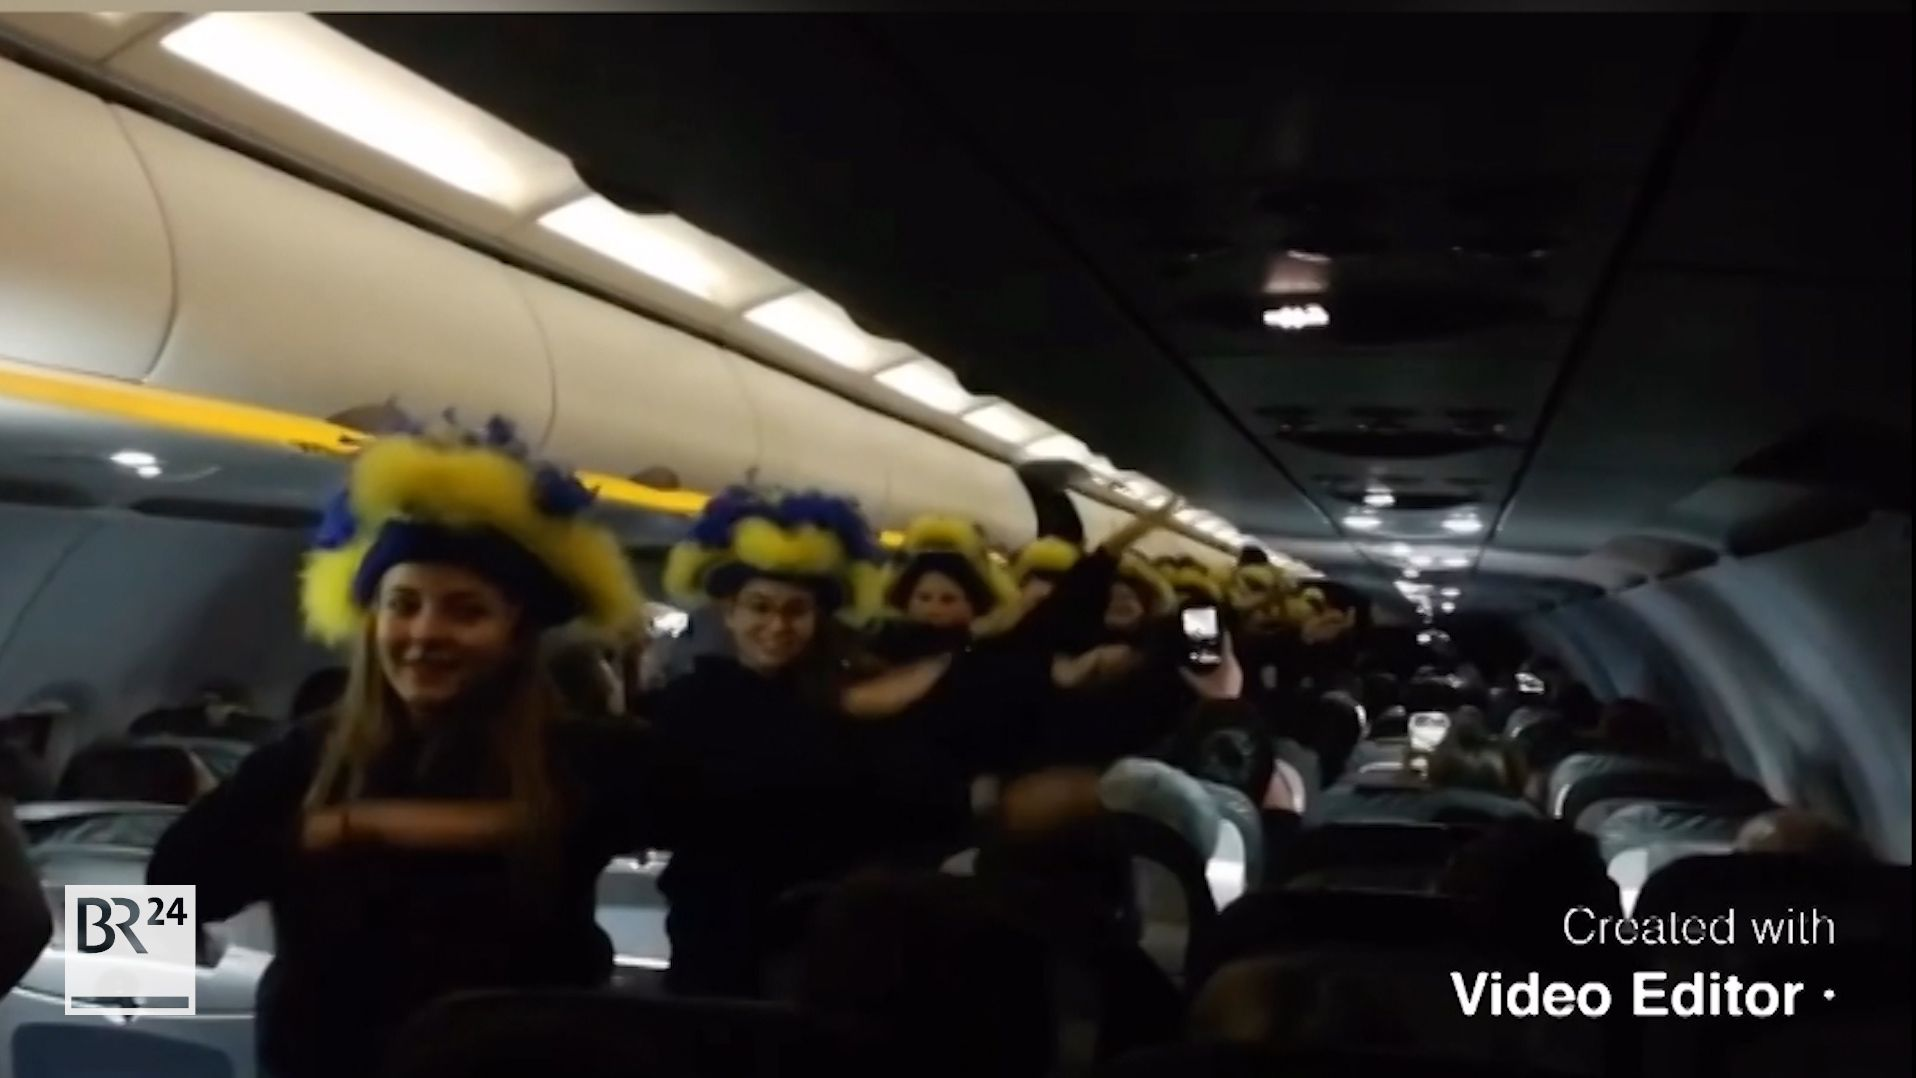 Kurioses Video: Bogener Faschingsgarde tanzt spontan in Flugzeug